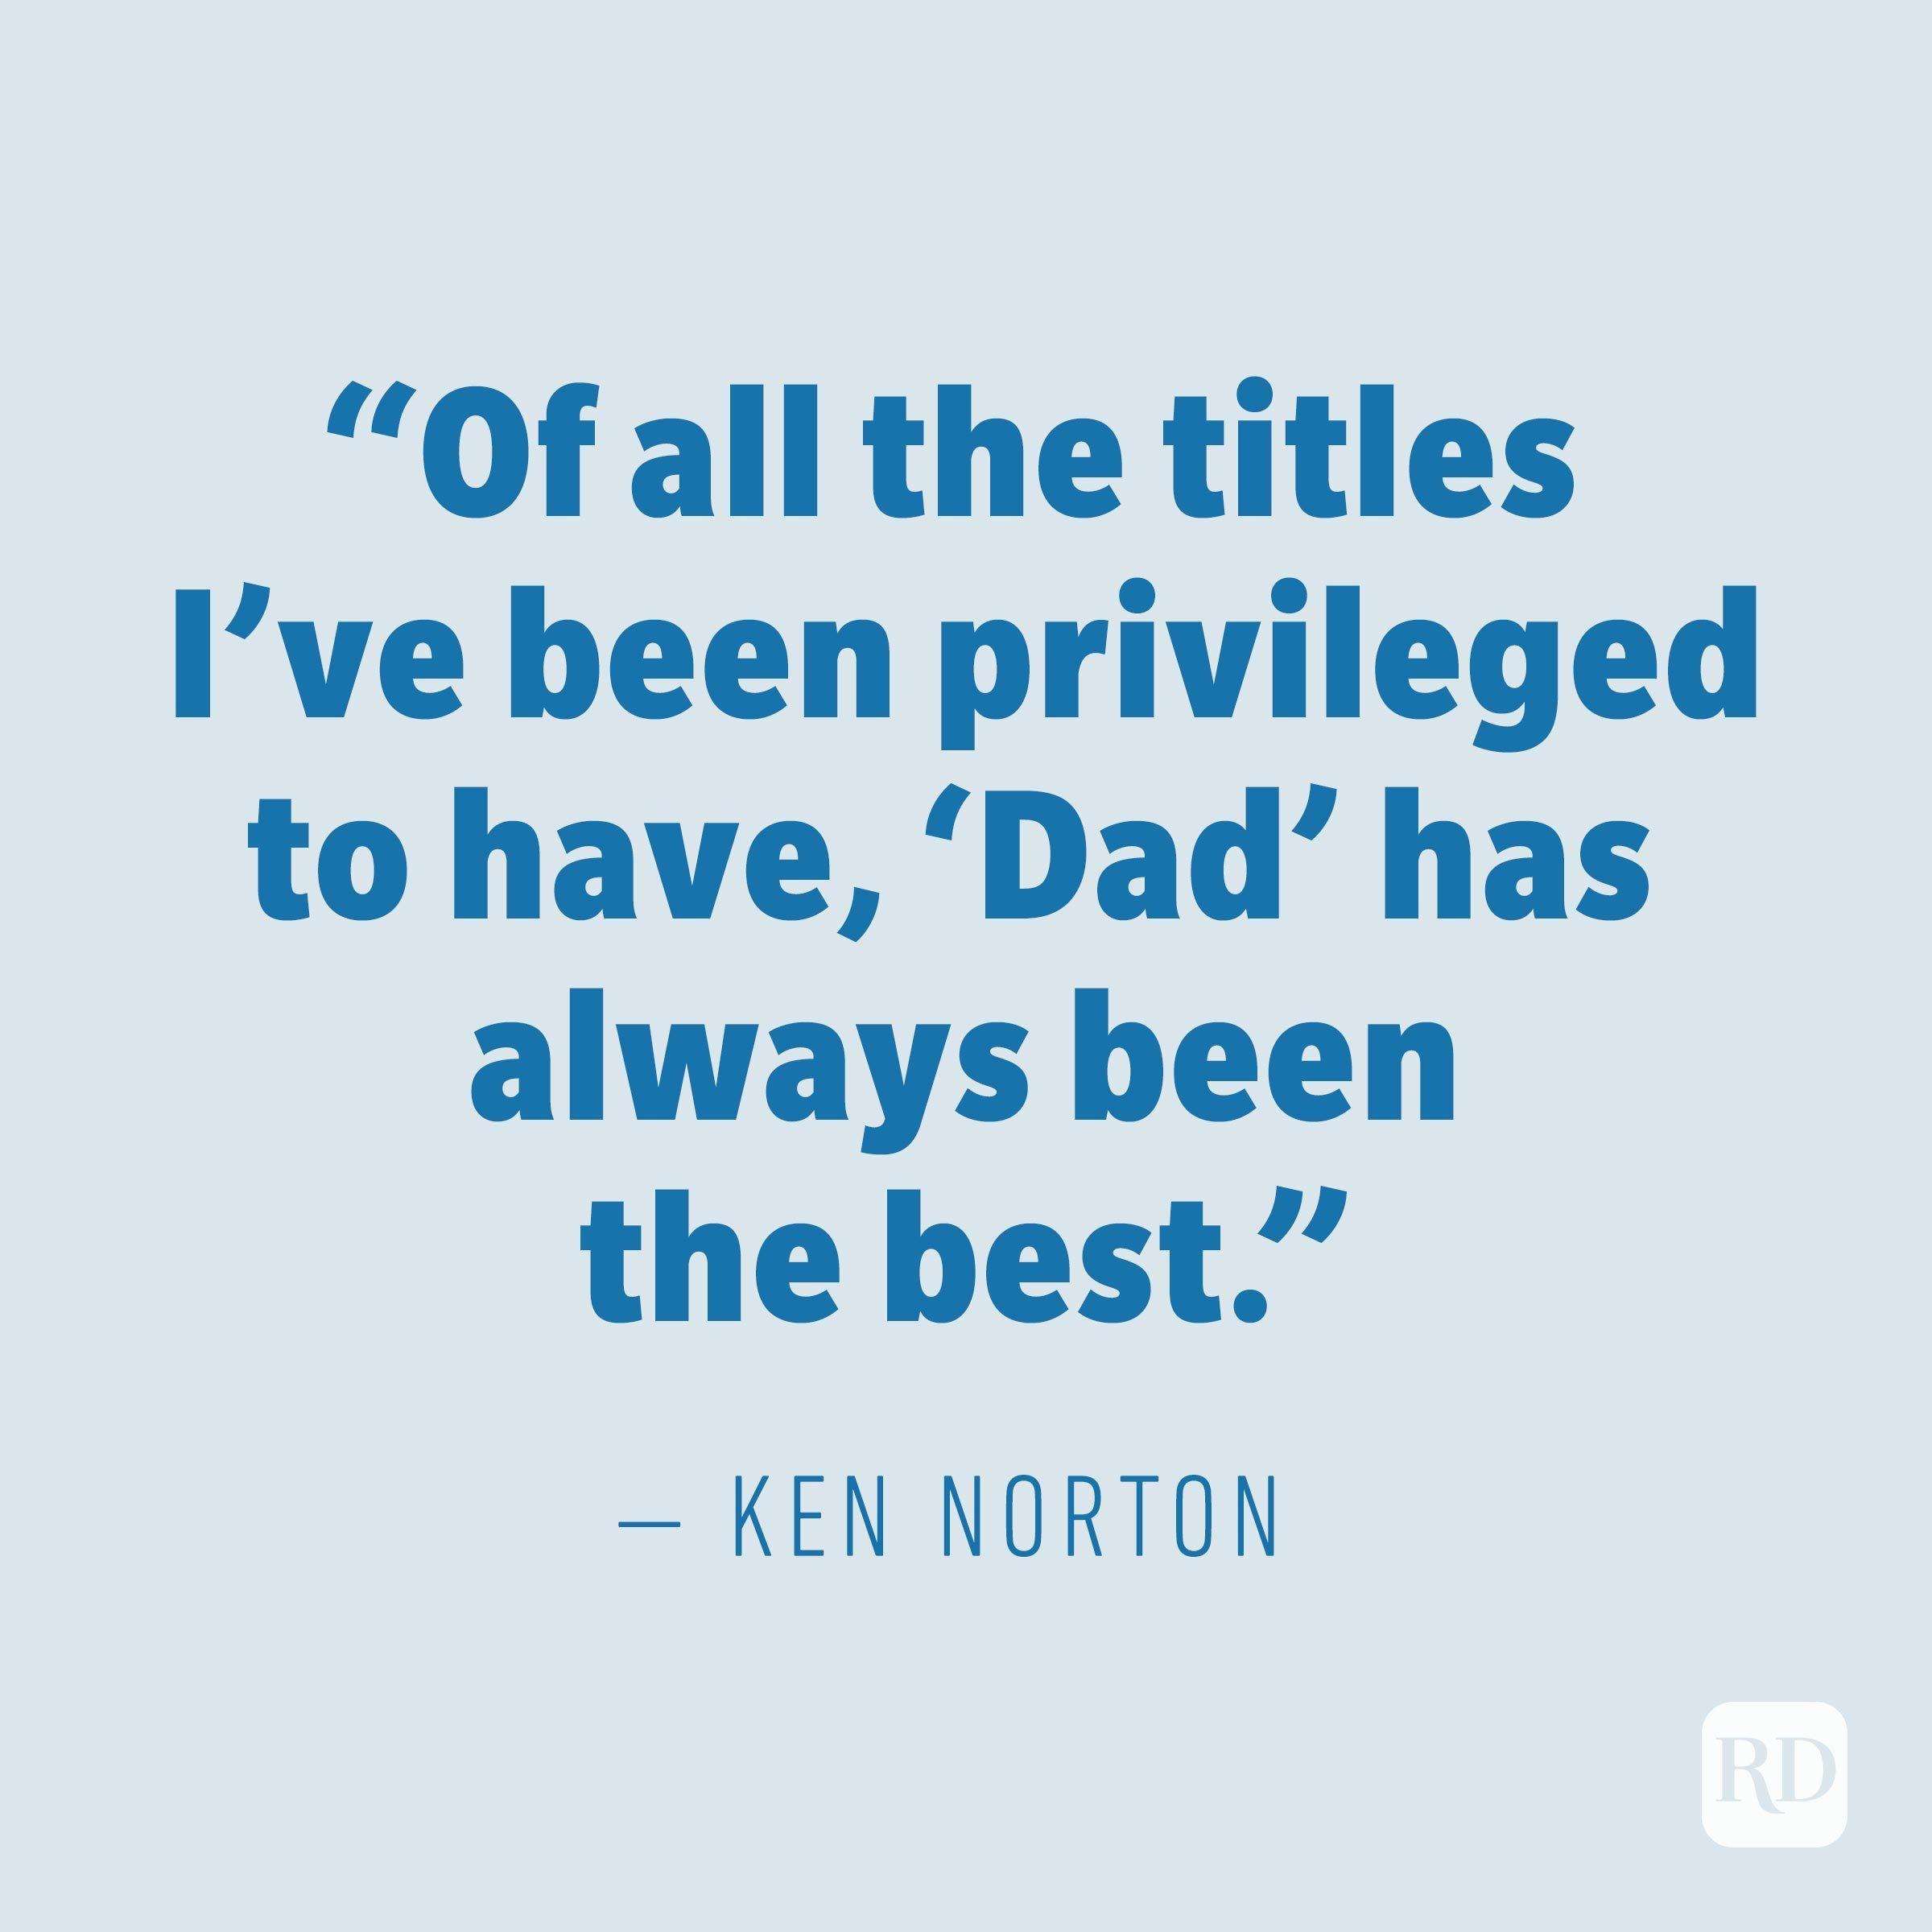 Ken Norton quote